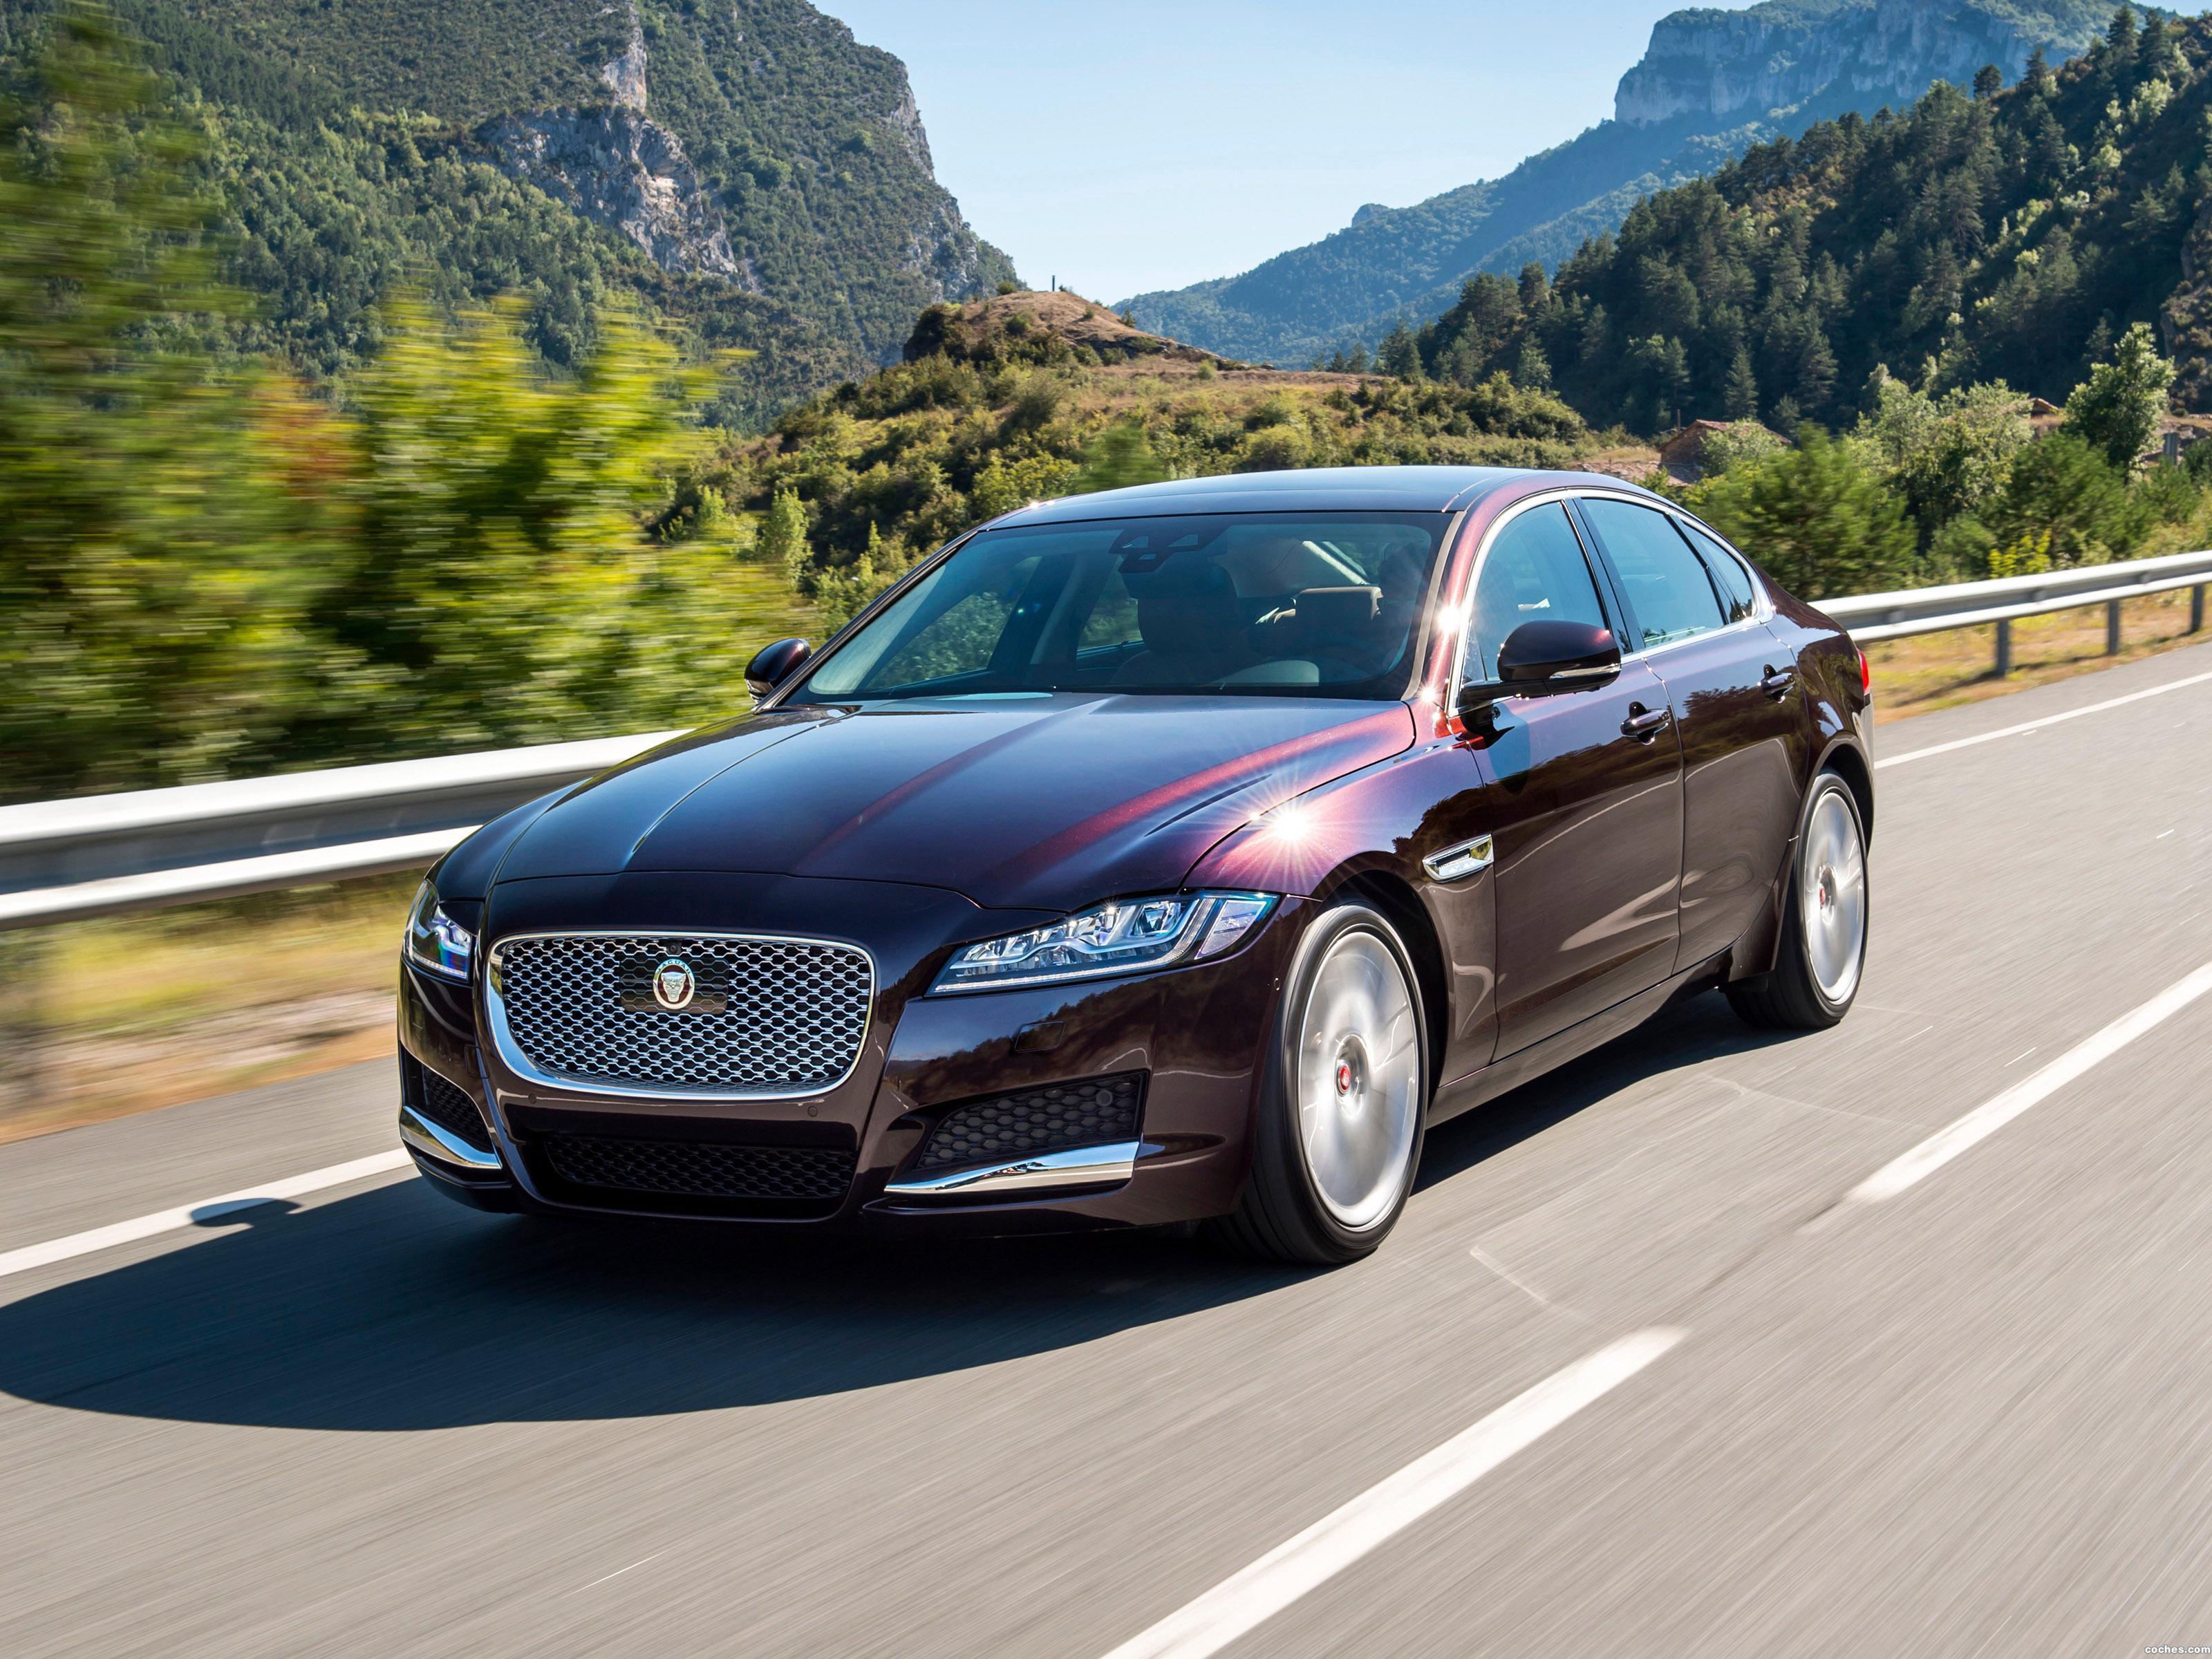 Foto 0 de Jaguar XF Prestige 2015